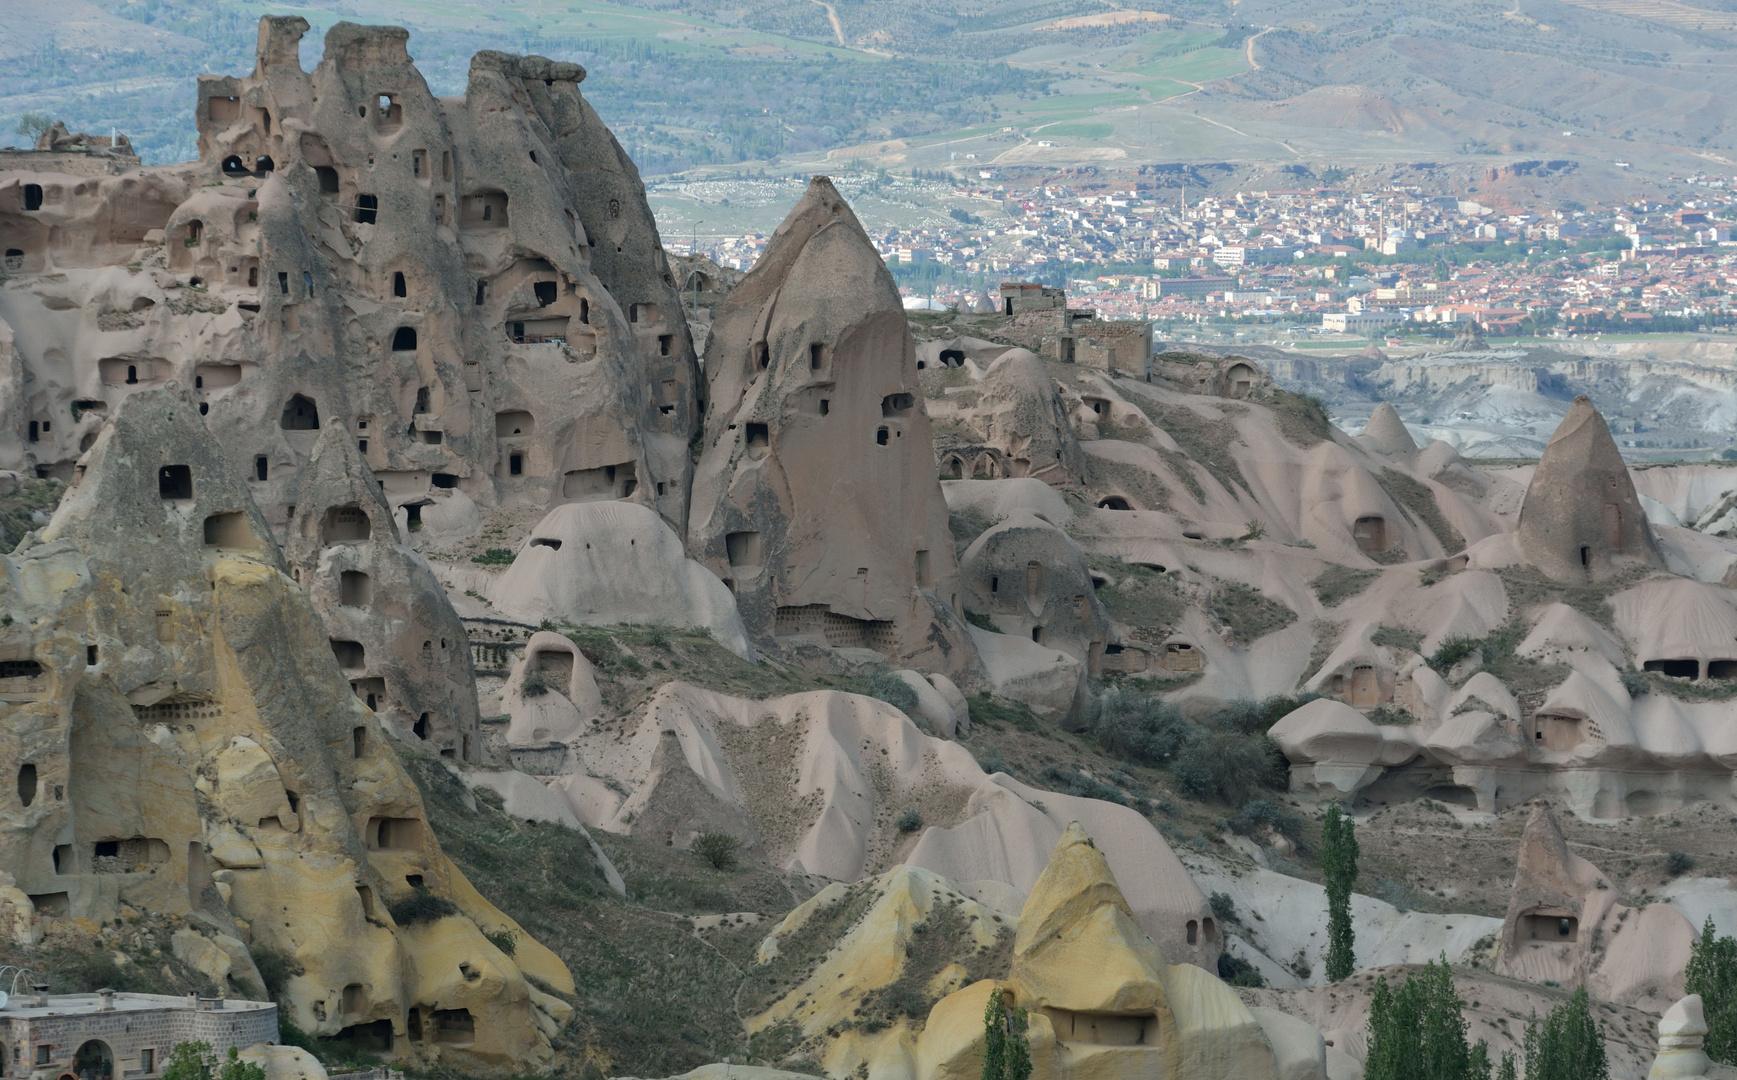 Tuffsteinlandschaft in Kapadokien